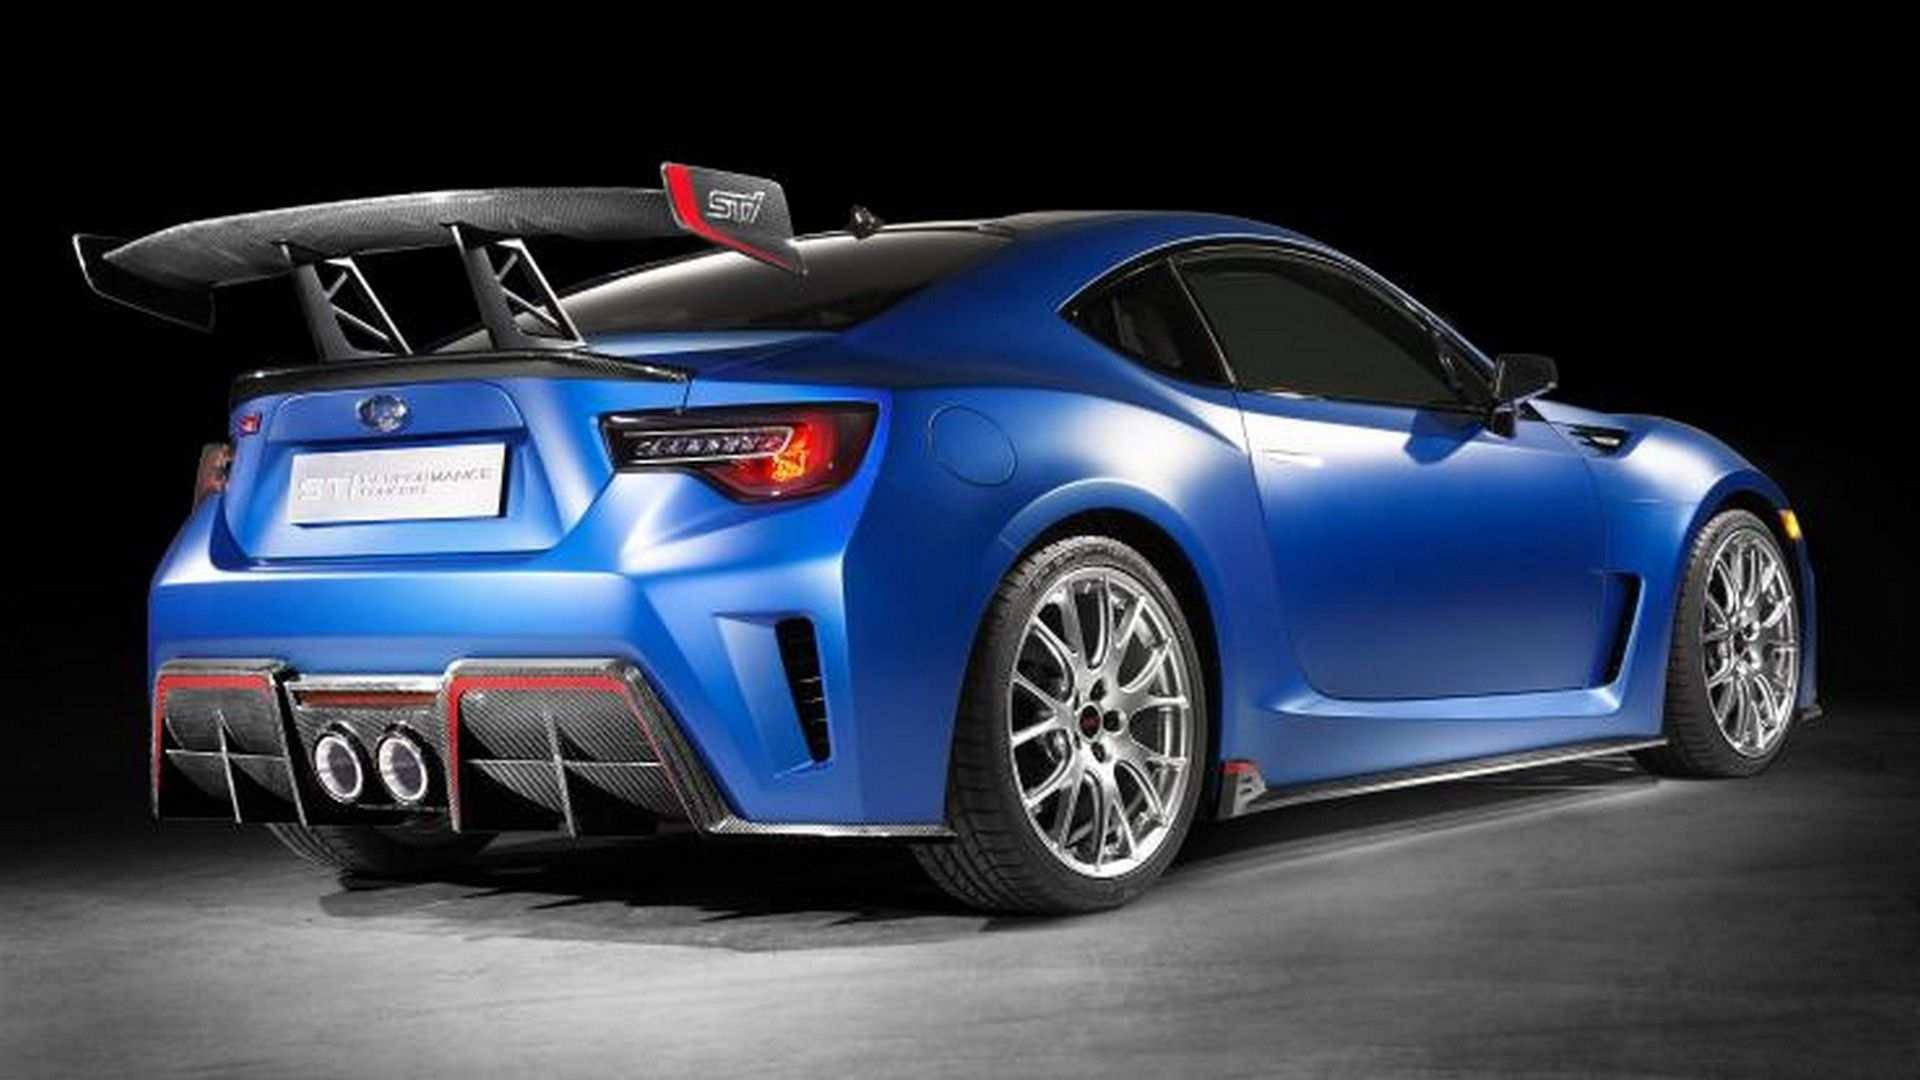 90 All New Brz Subaru 2020 Performance and New Engine with Brz Subaru 2020